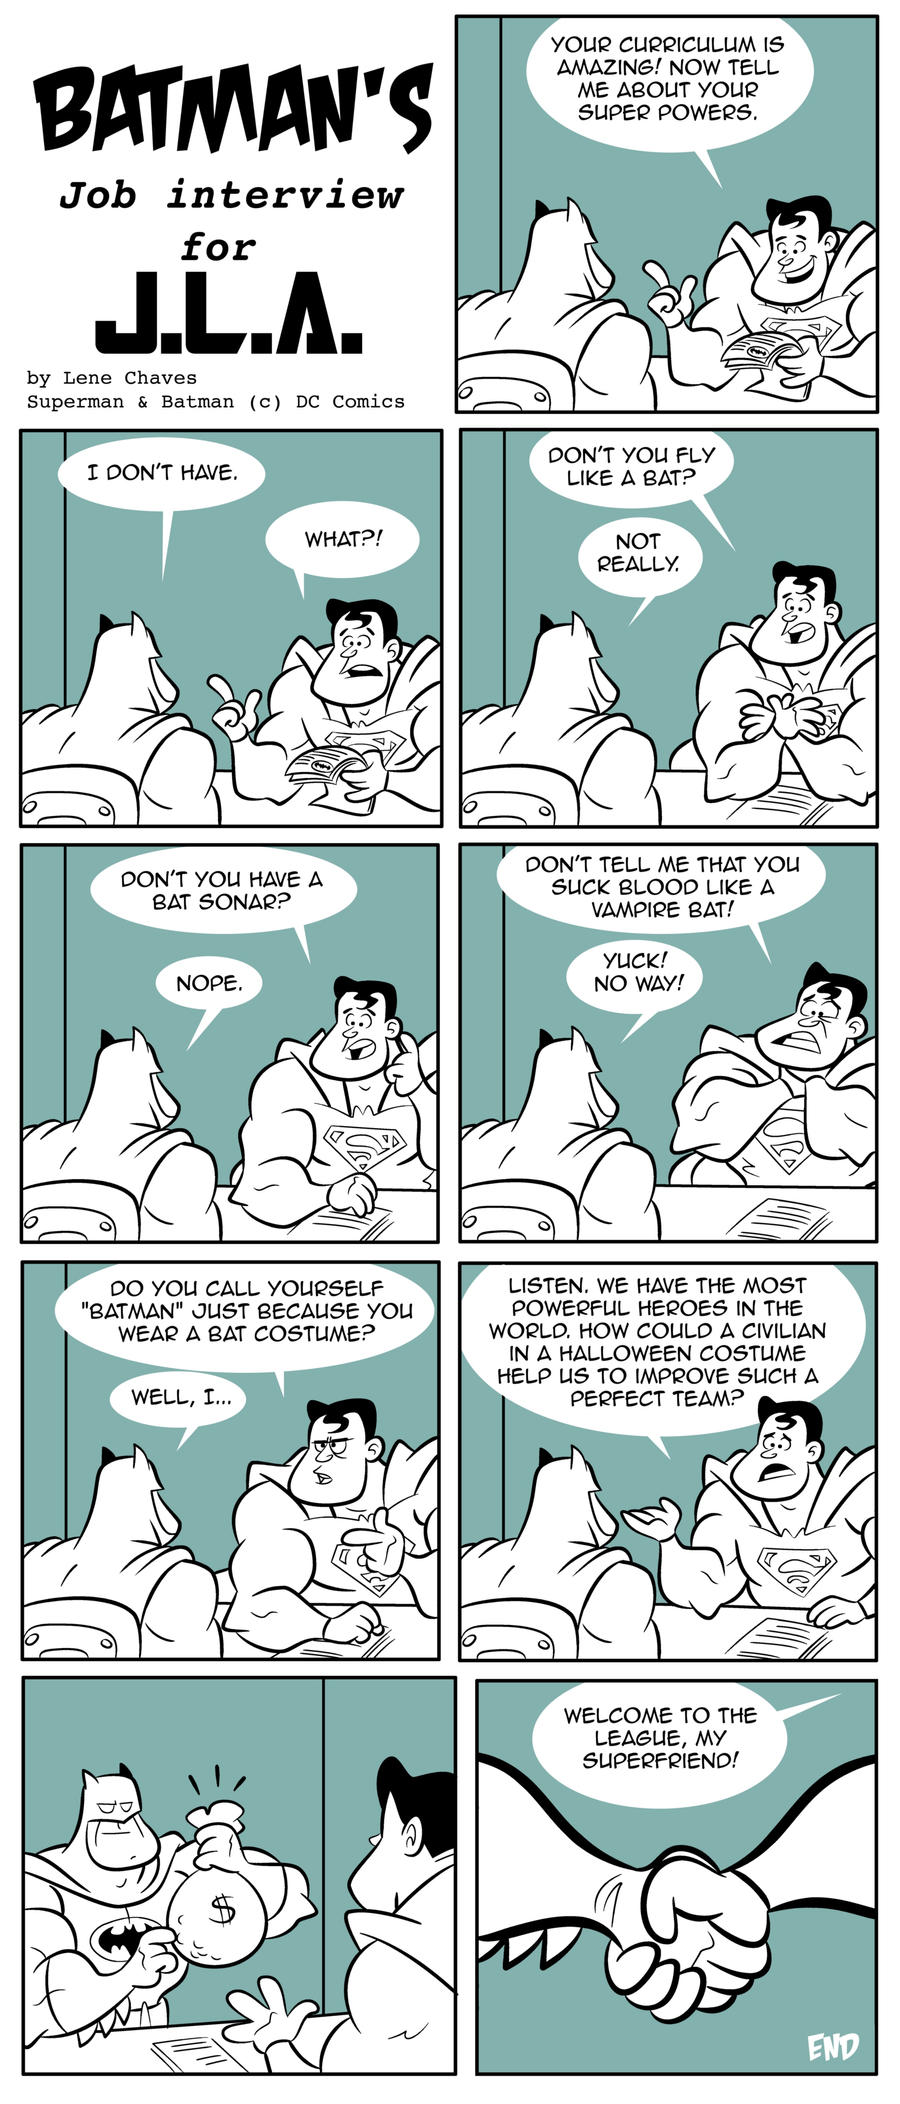 Batmans job interview by BezerroBizarro